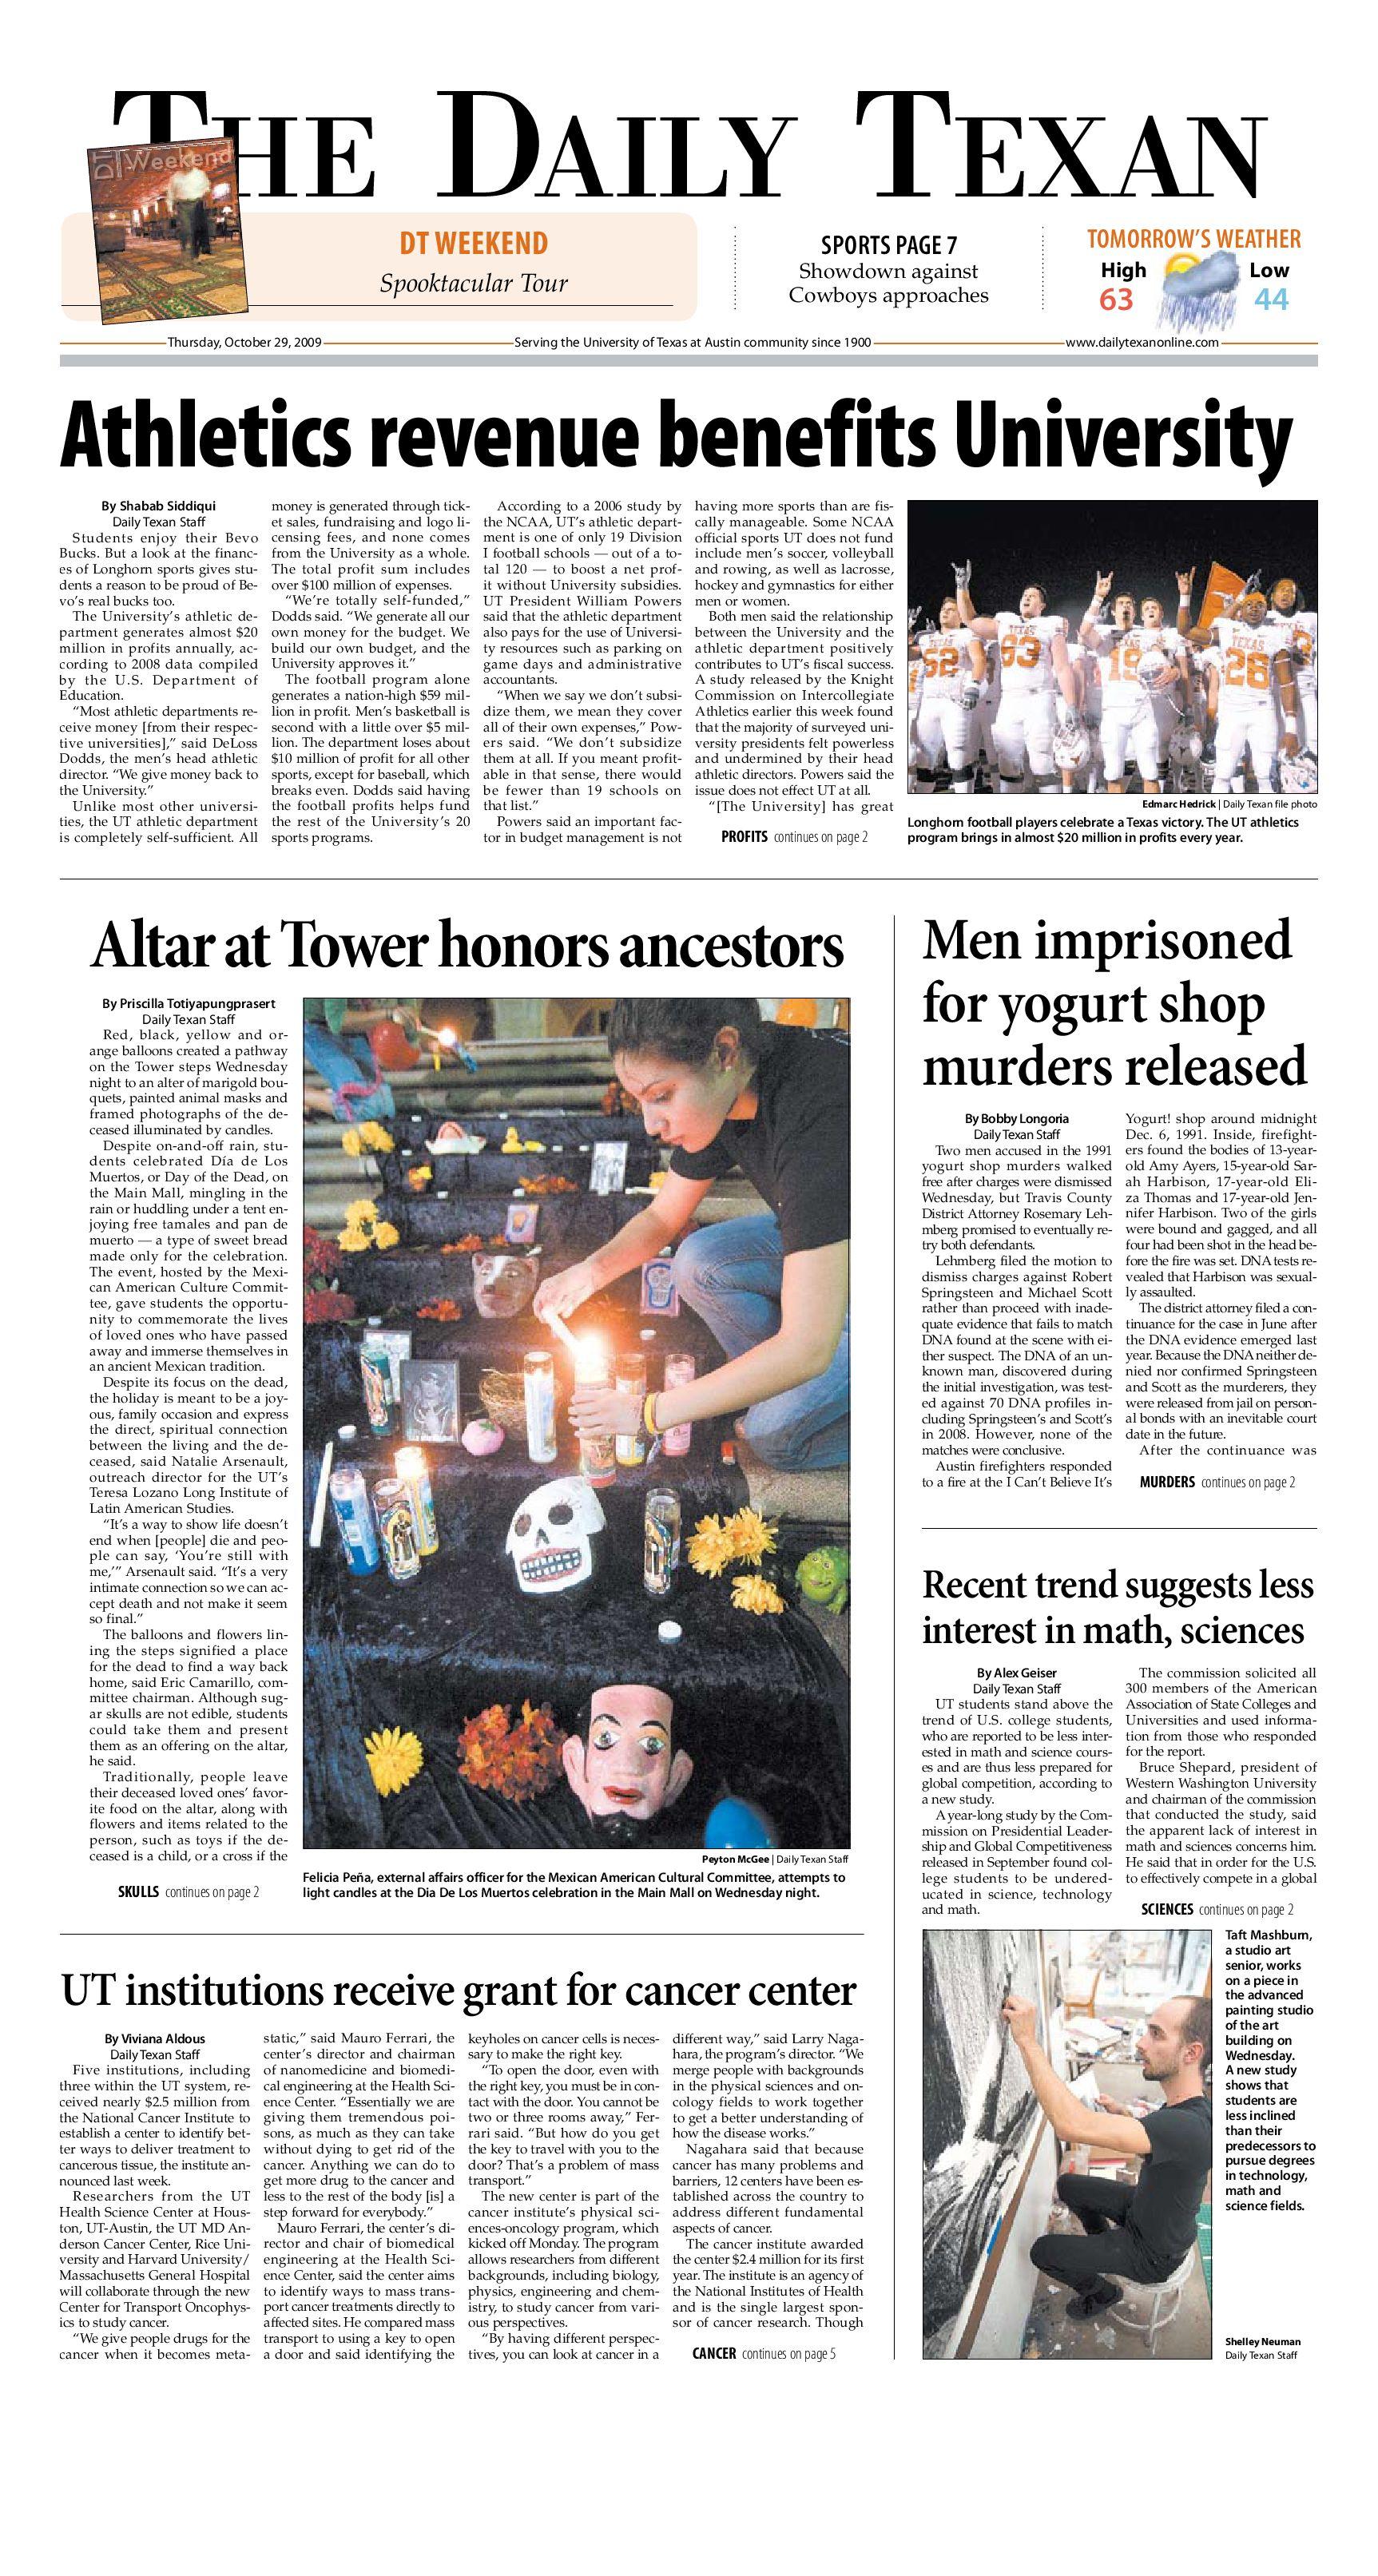 Daily Texan 10-29-09 by The Daily Texan - issuu